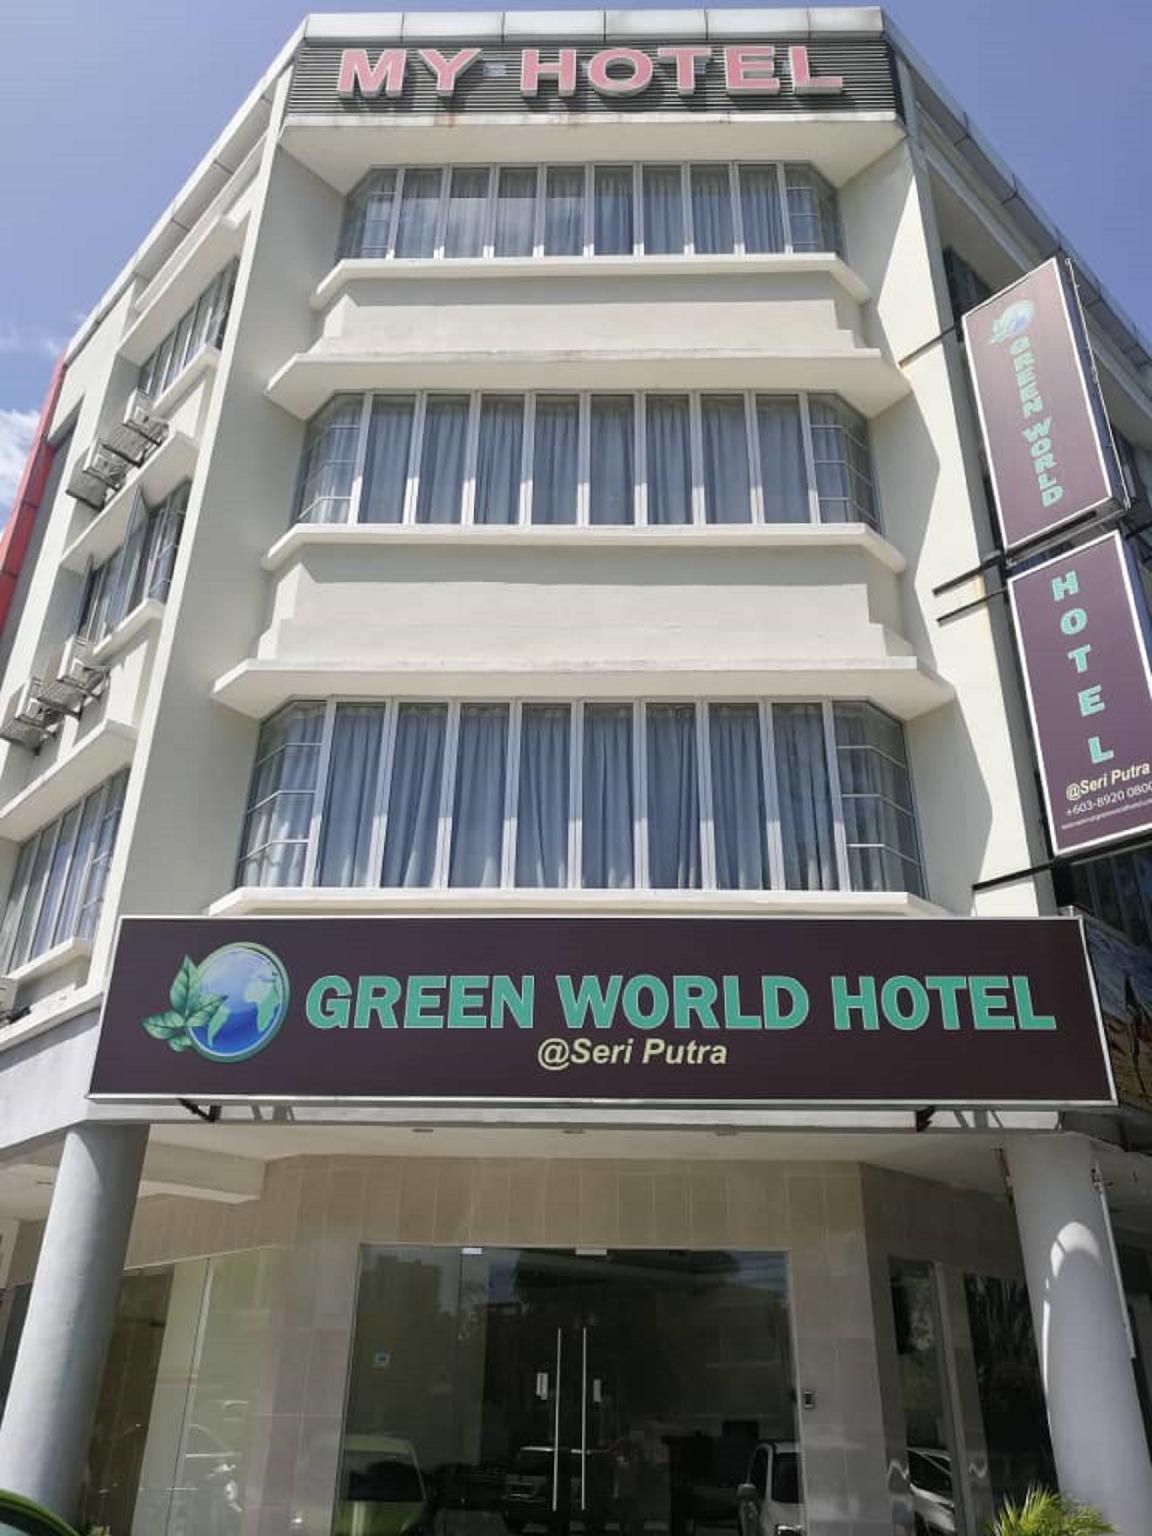 Green World Hotel @ Seri Putra